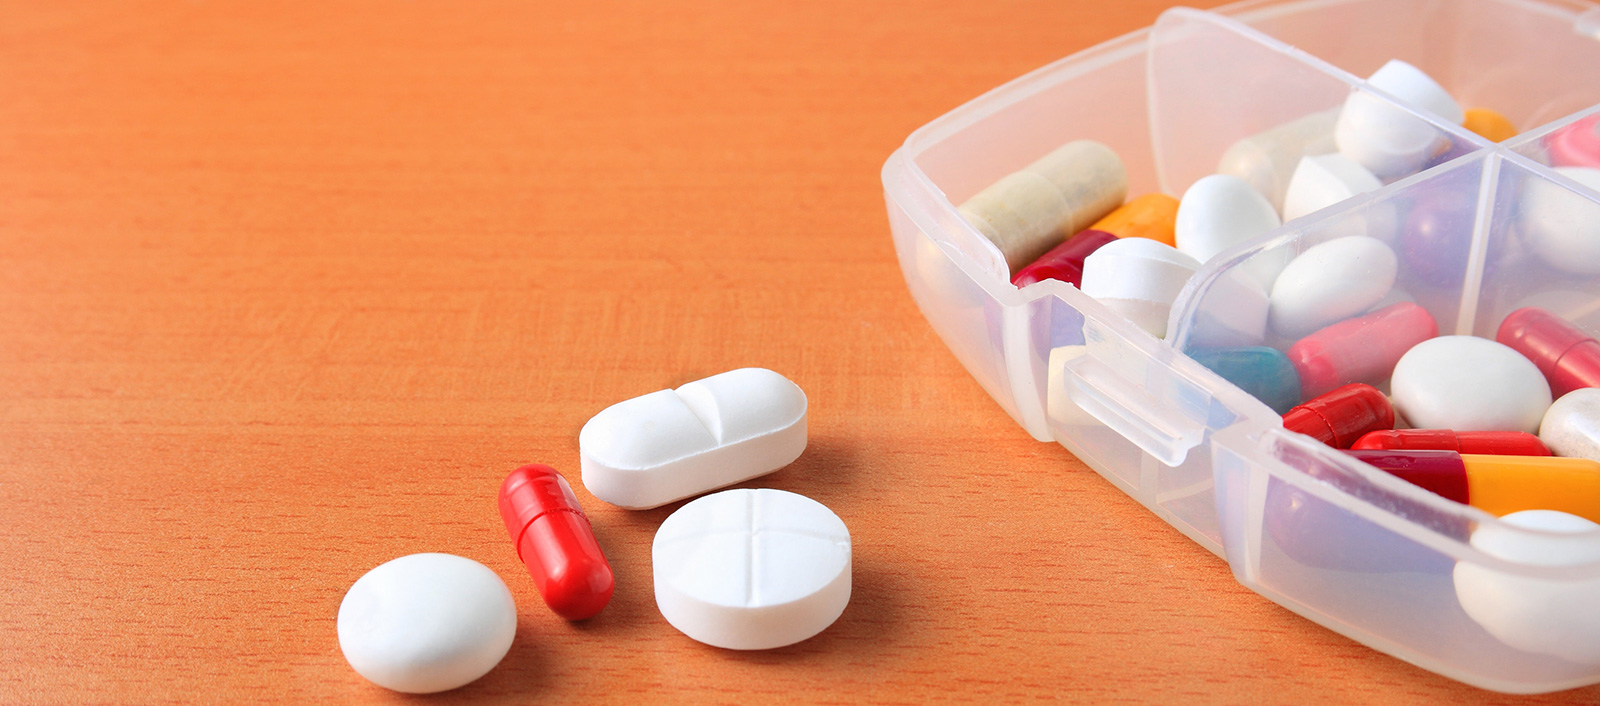 2018 medicament prescrit par medecin pour maigrir